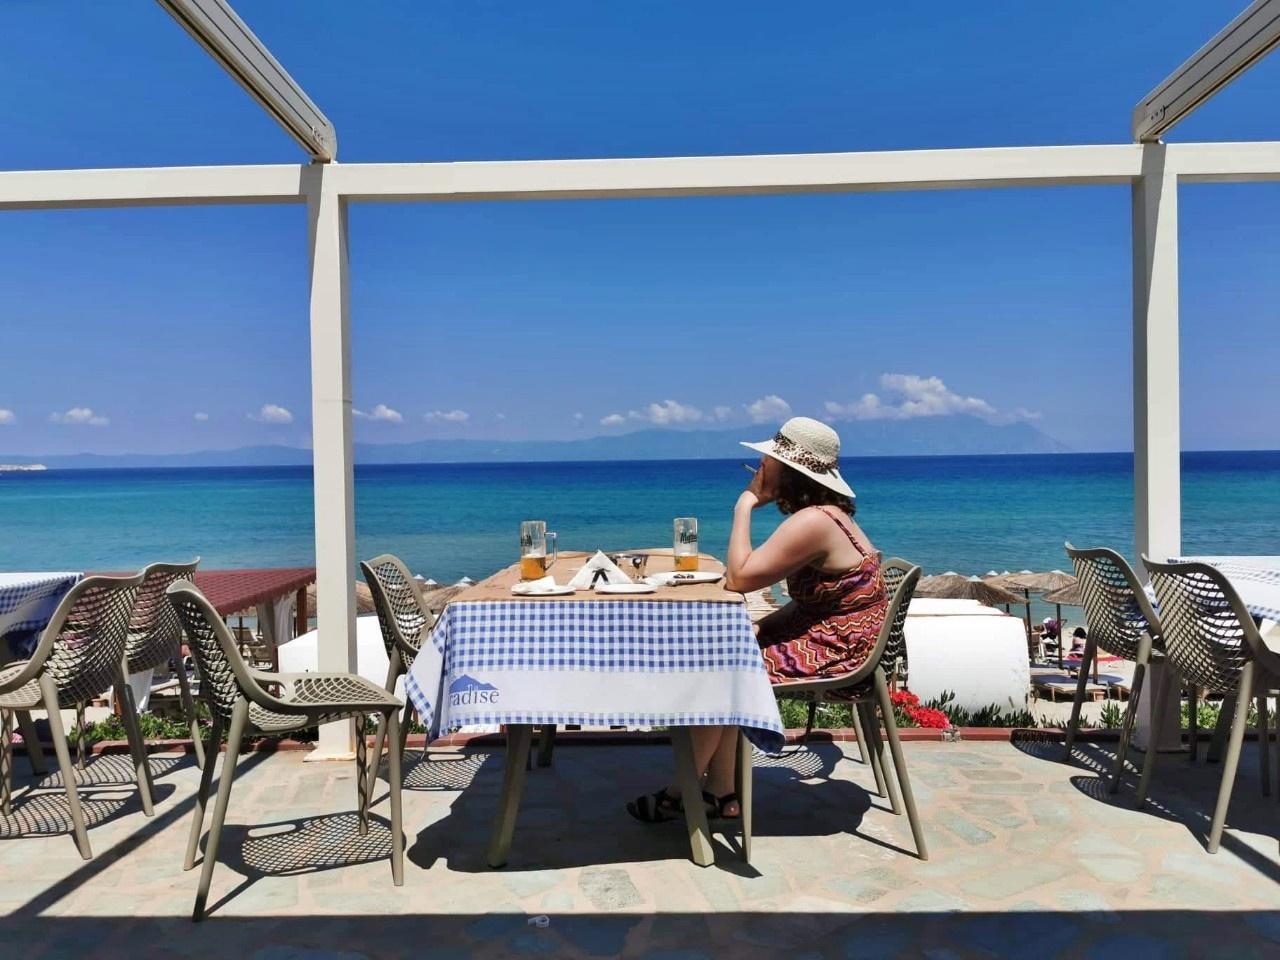 Kocsmaturista - Kocsmázva utazni, utazva kocsmázni - Ágotai Krisztina - Sarti, Görögország